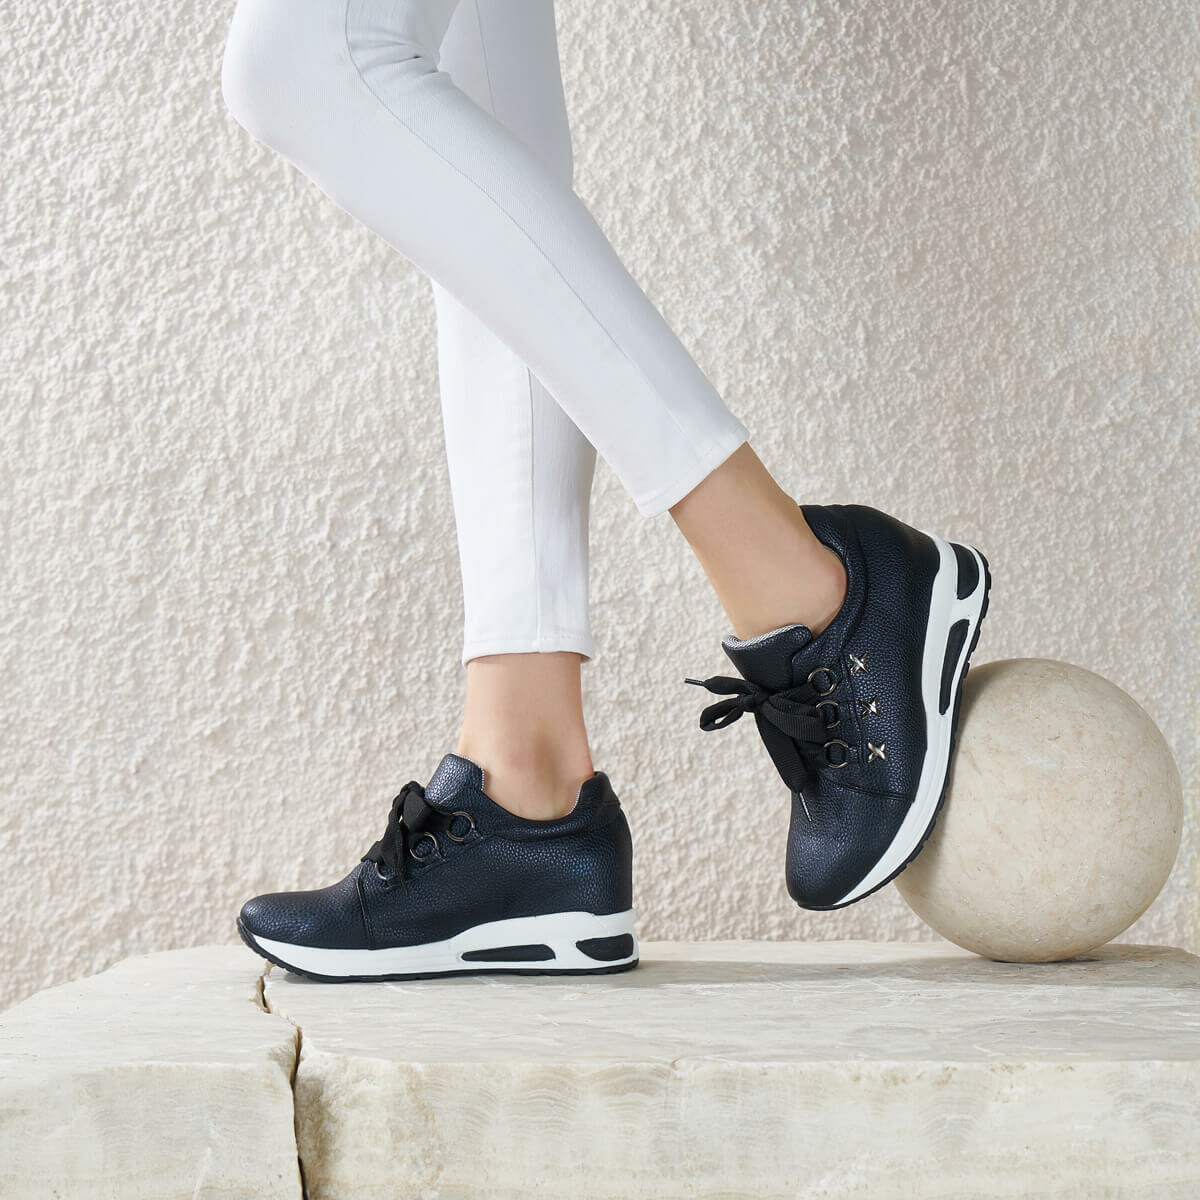 FLO TARAT85Z SKIN Black Women Shoes BUTIGO